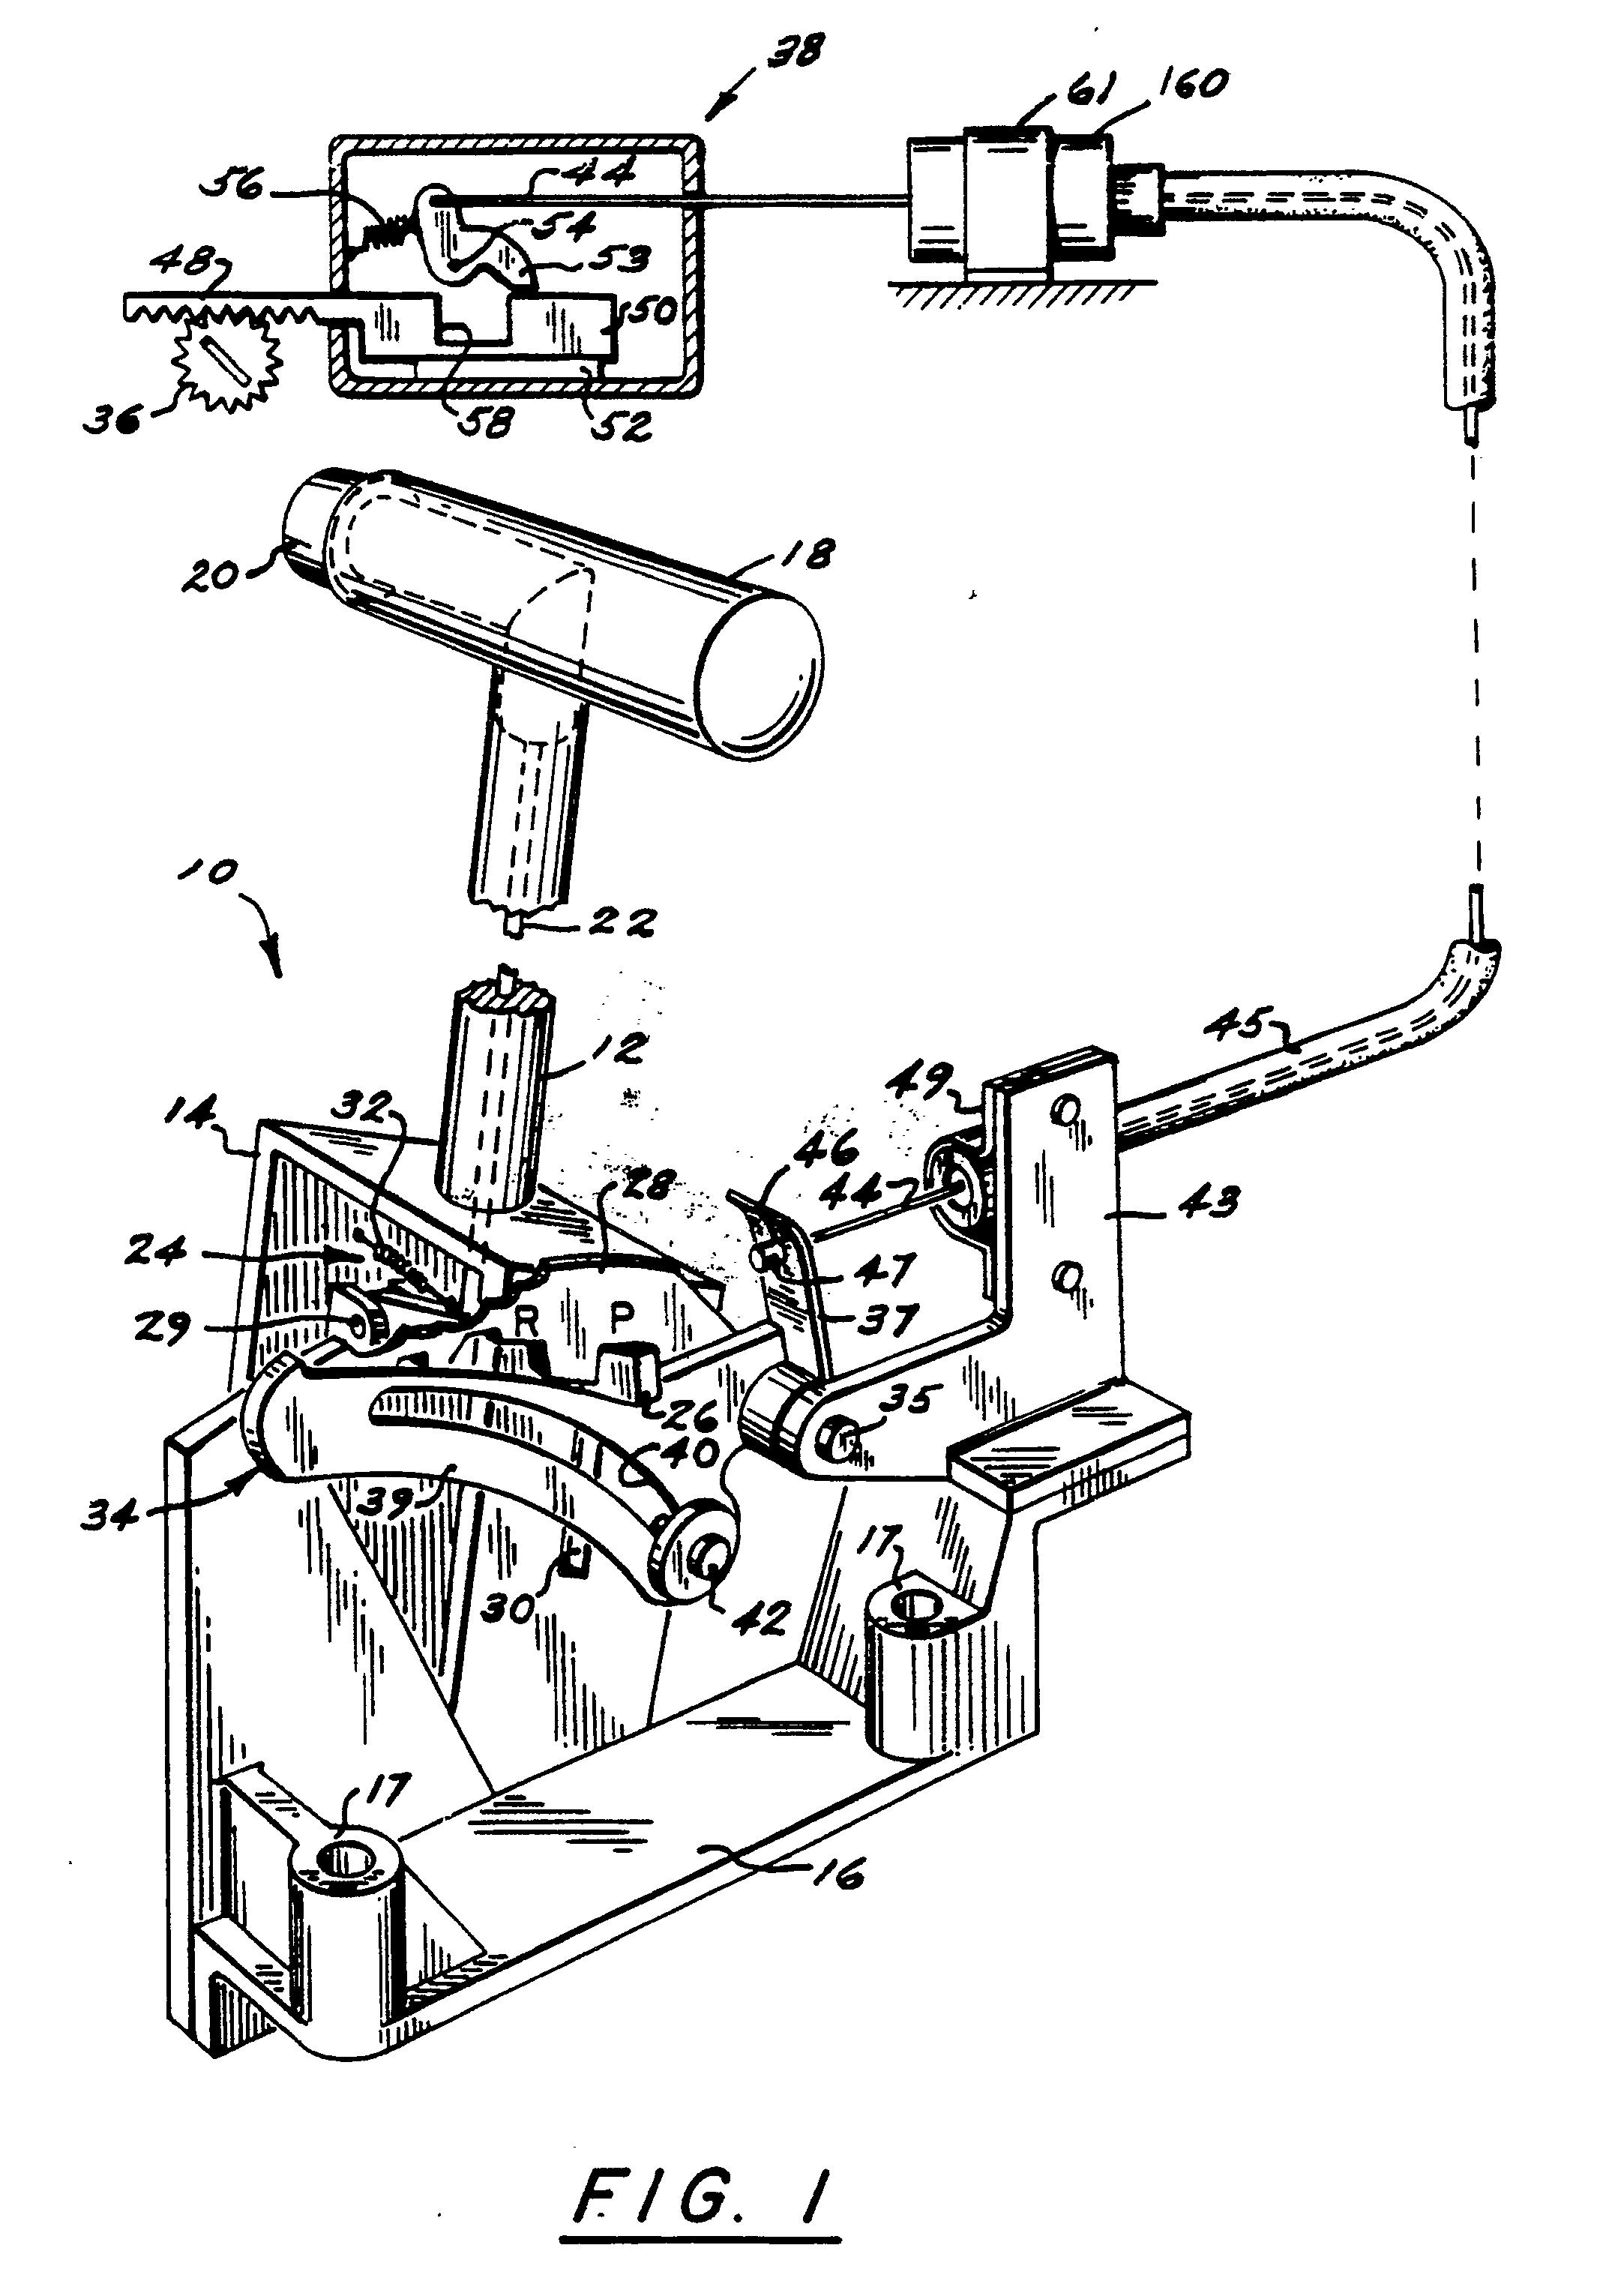 diagrama de fusibles ford windstar 1999  diagrama  free